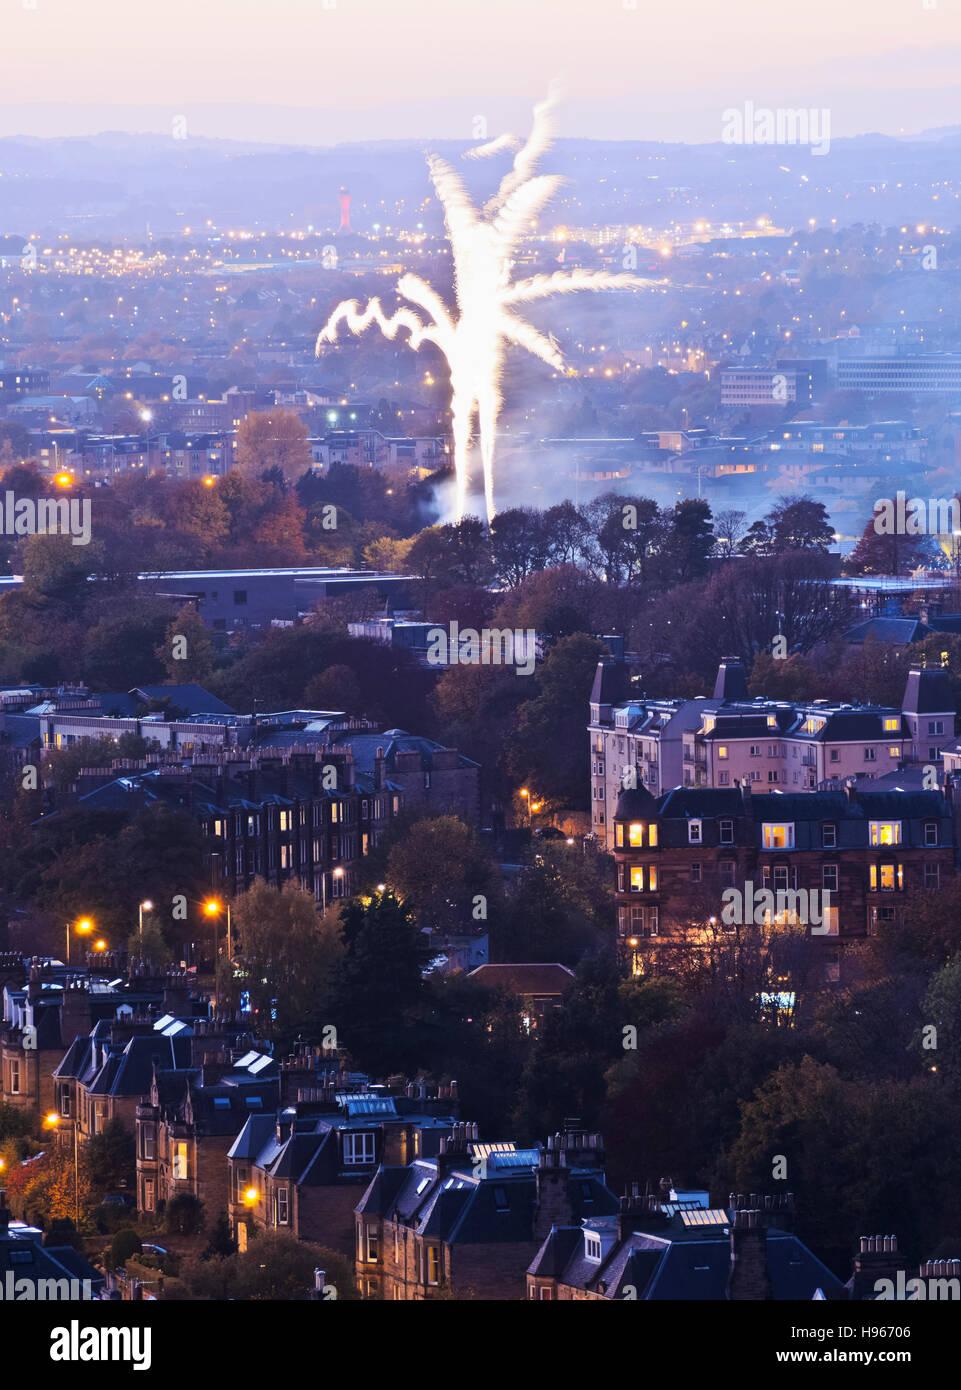 UK, Scotland, Edinburgh, Fireworks over the Morningside Neighbourhood viewed from the Blackford Hill. - Stock Image